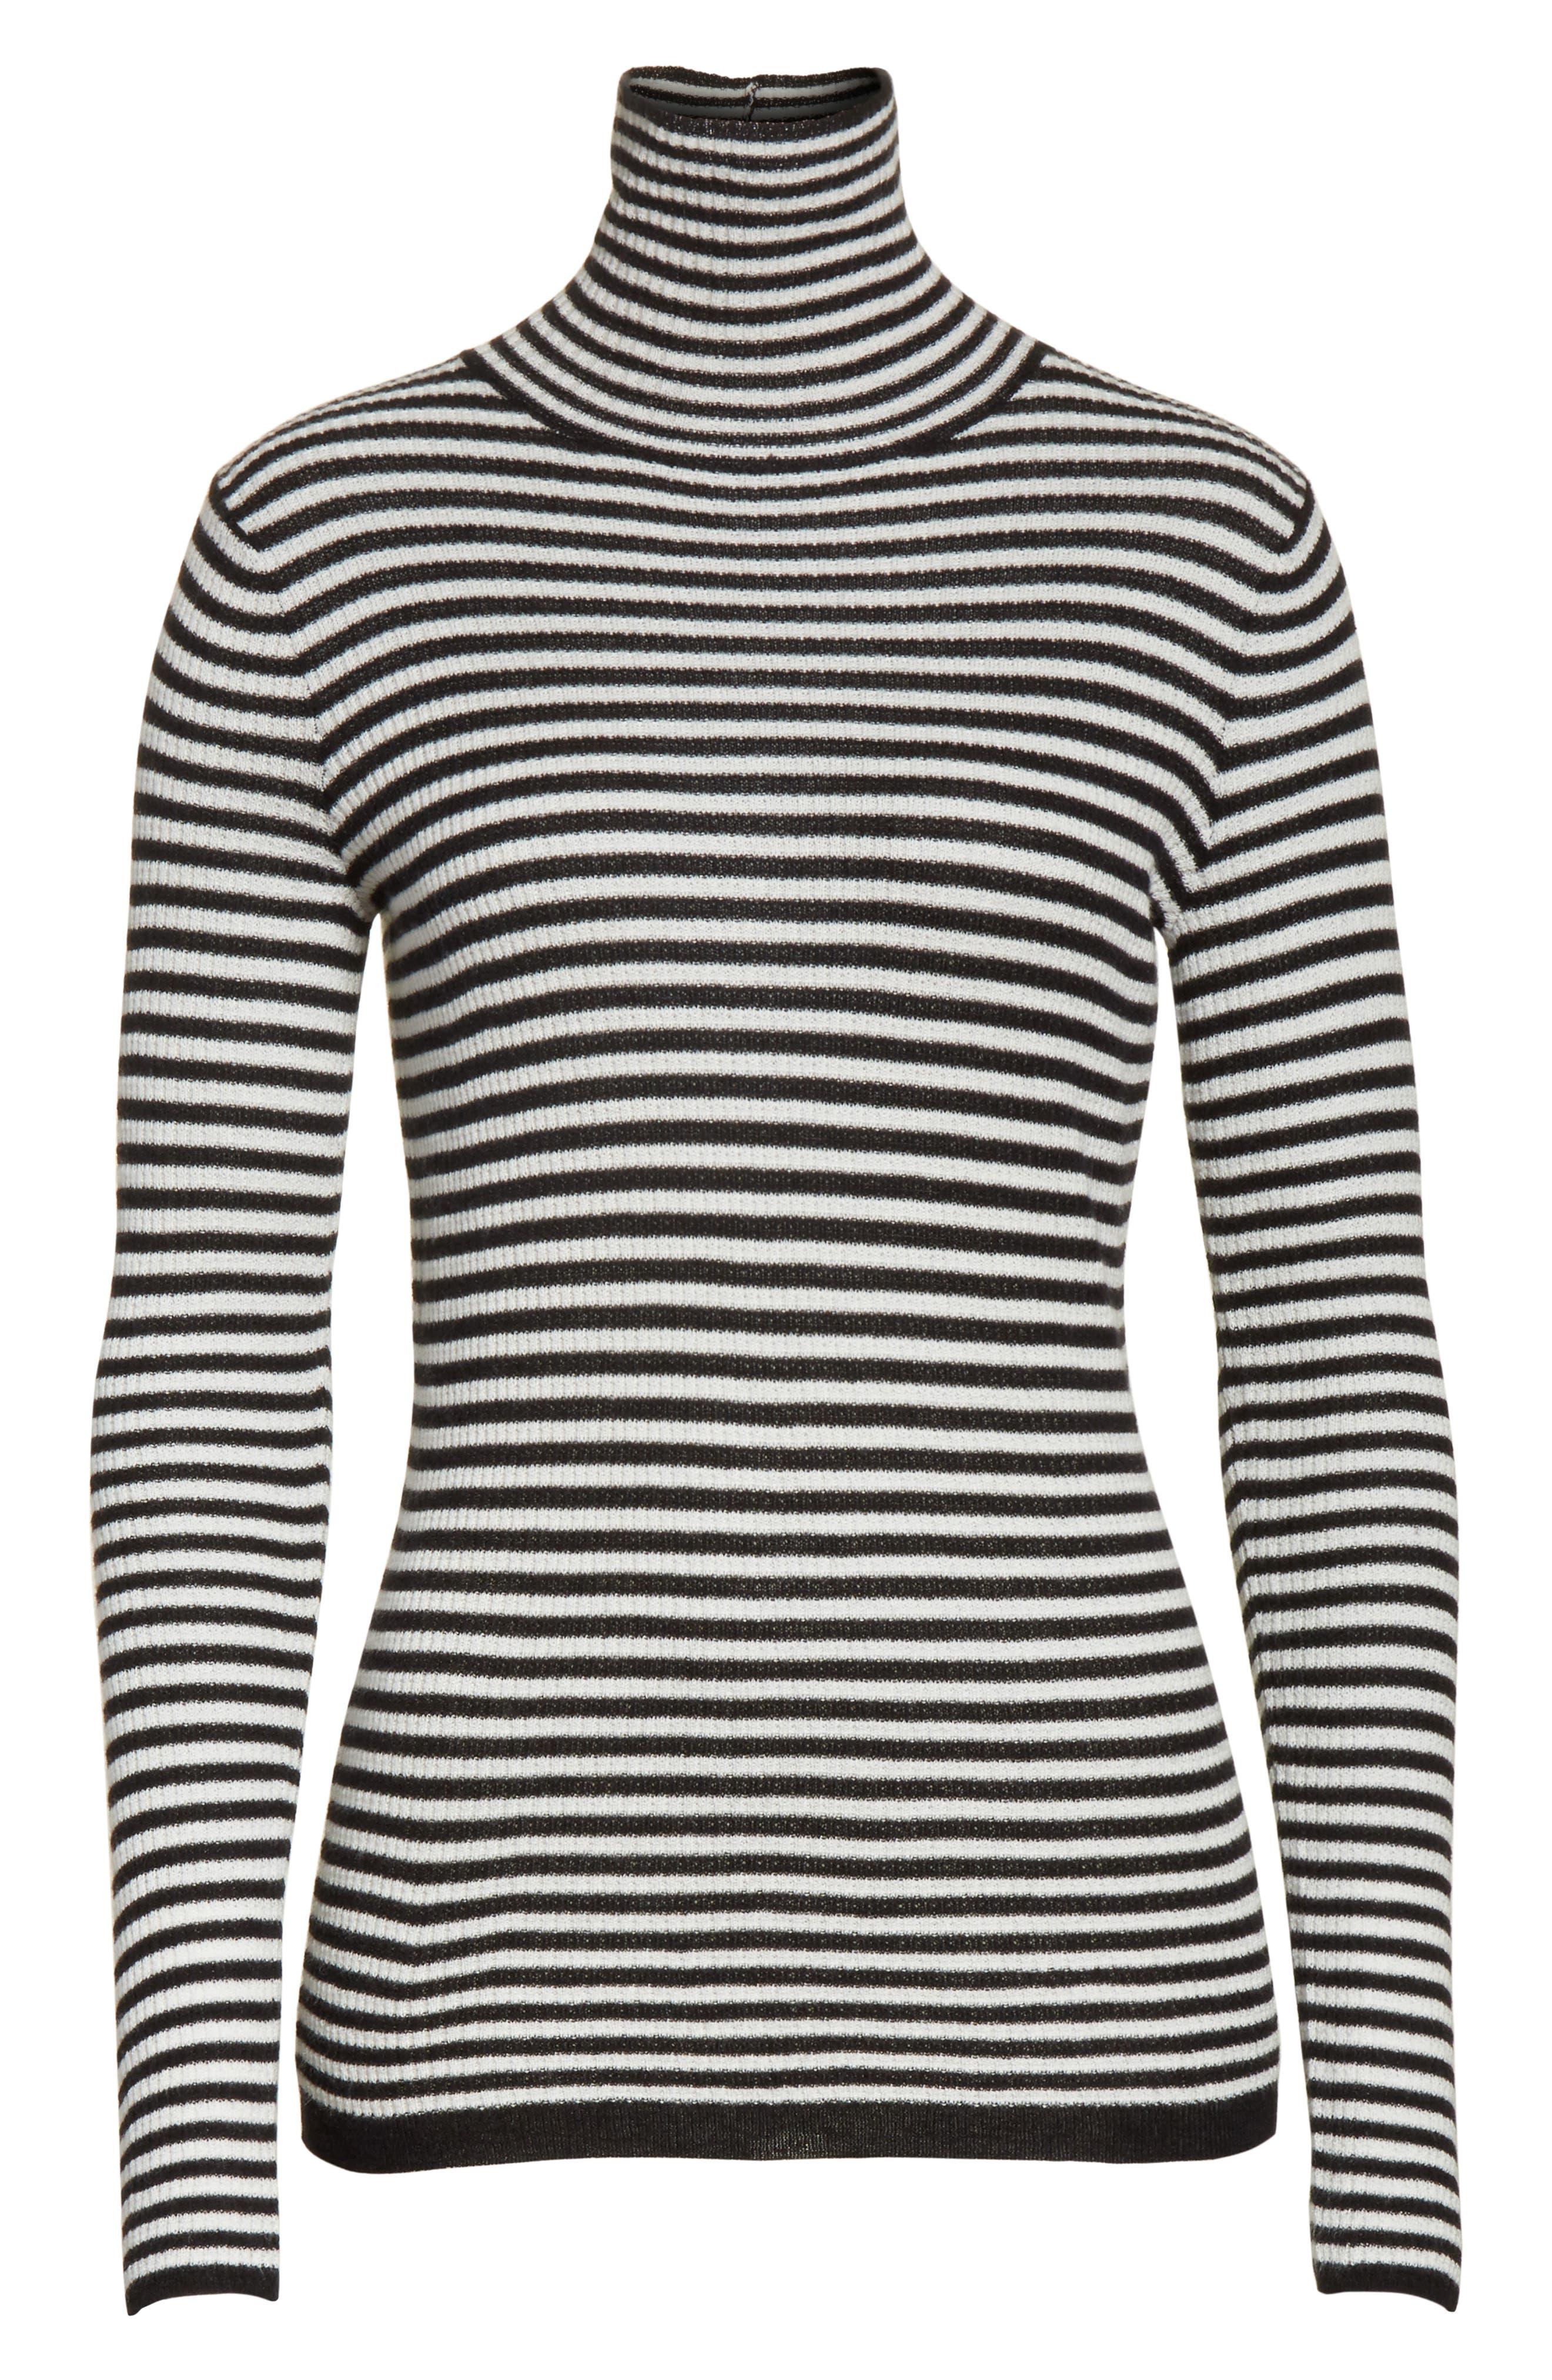 Zelene Stripe Cowl Neck Sweater,                             Alternate thumbnail 6, color,                             Caviar/ Porceclain